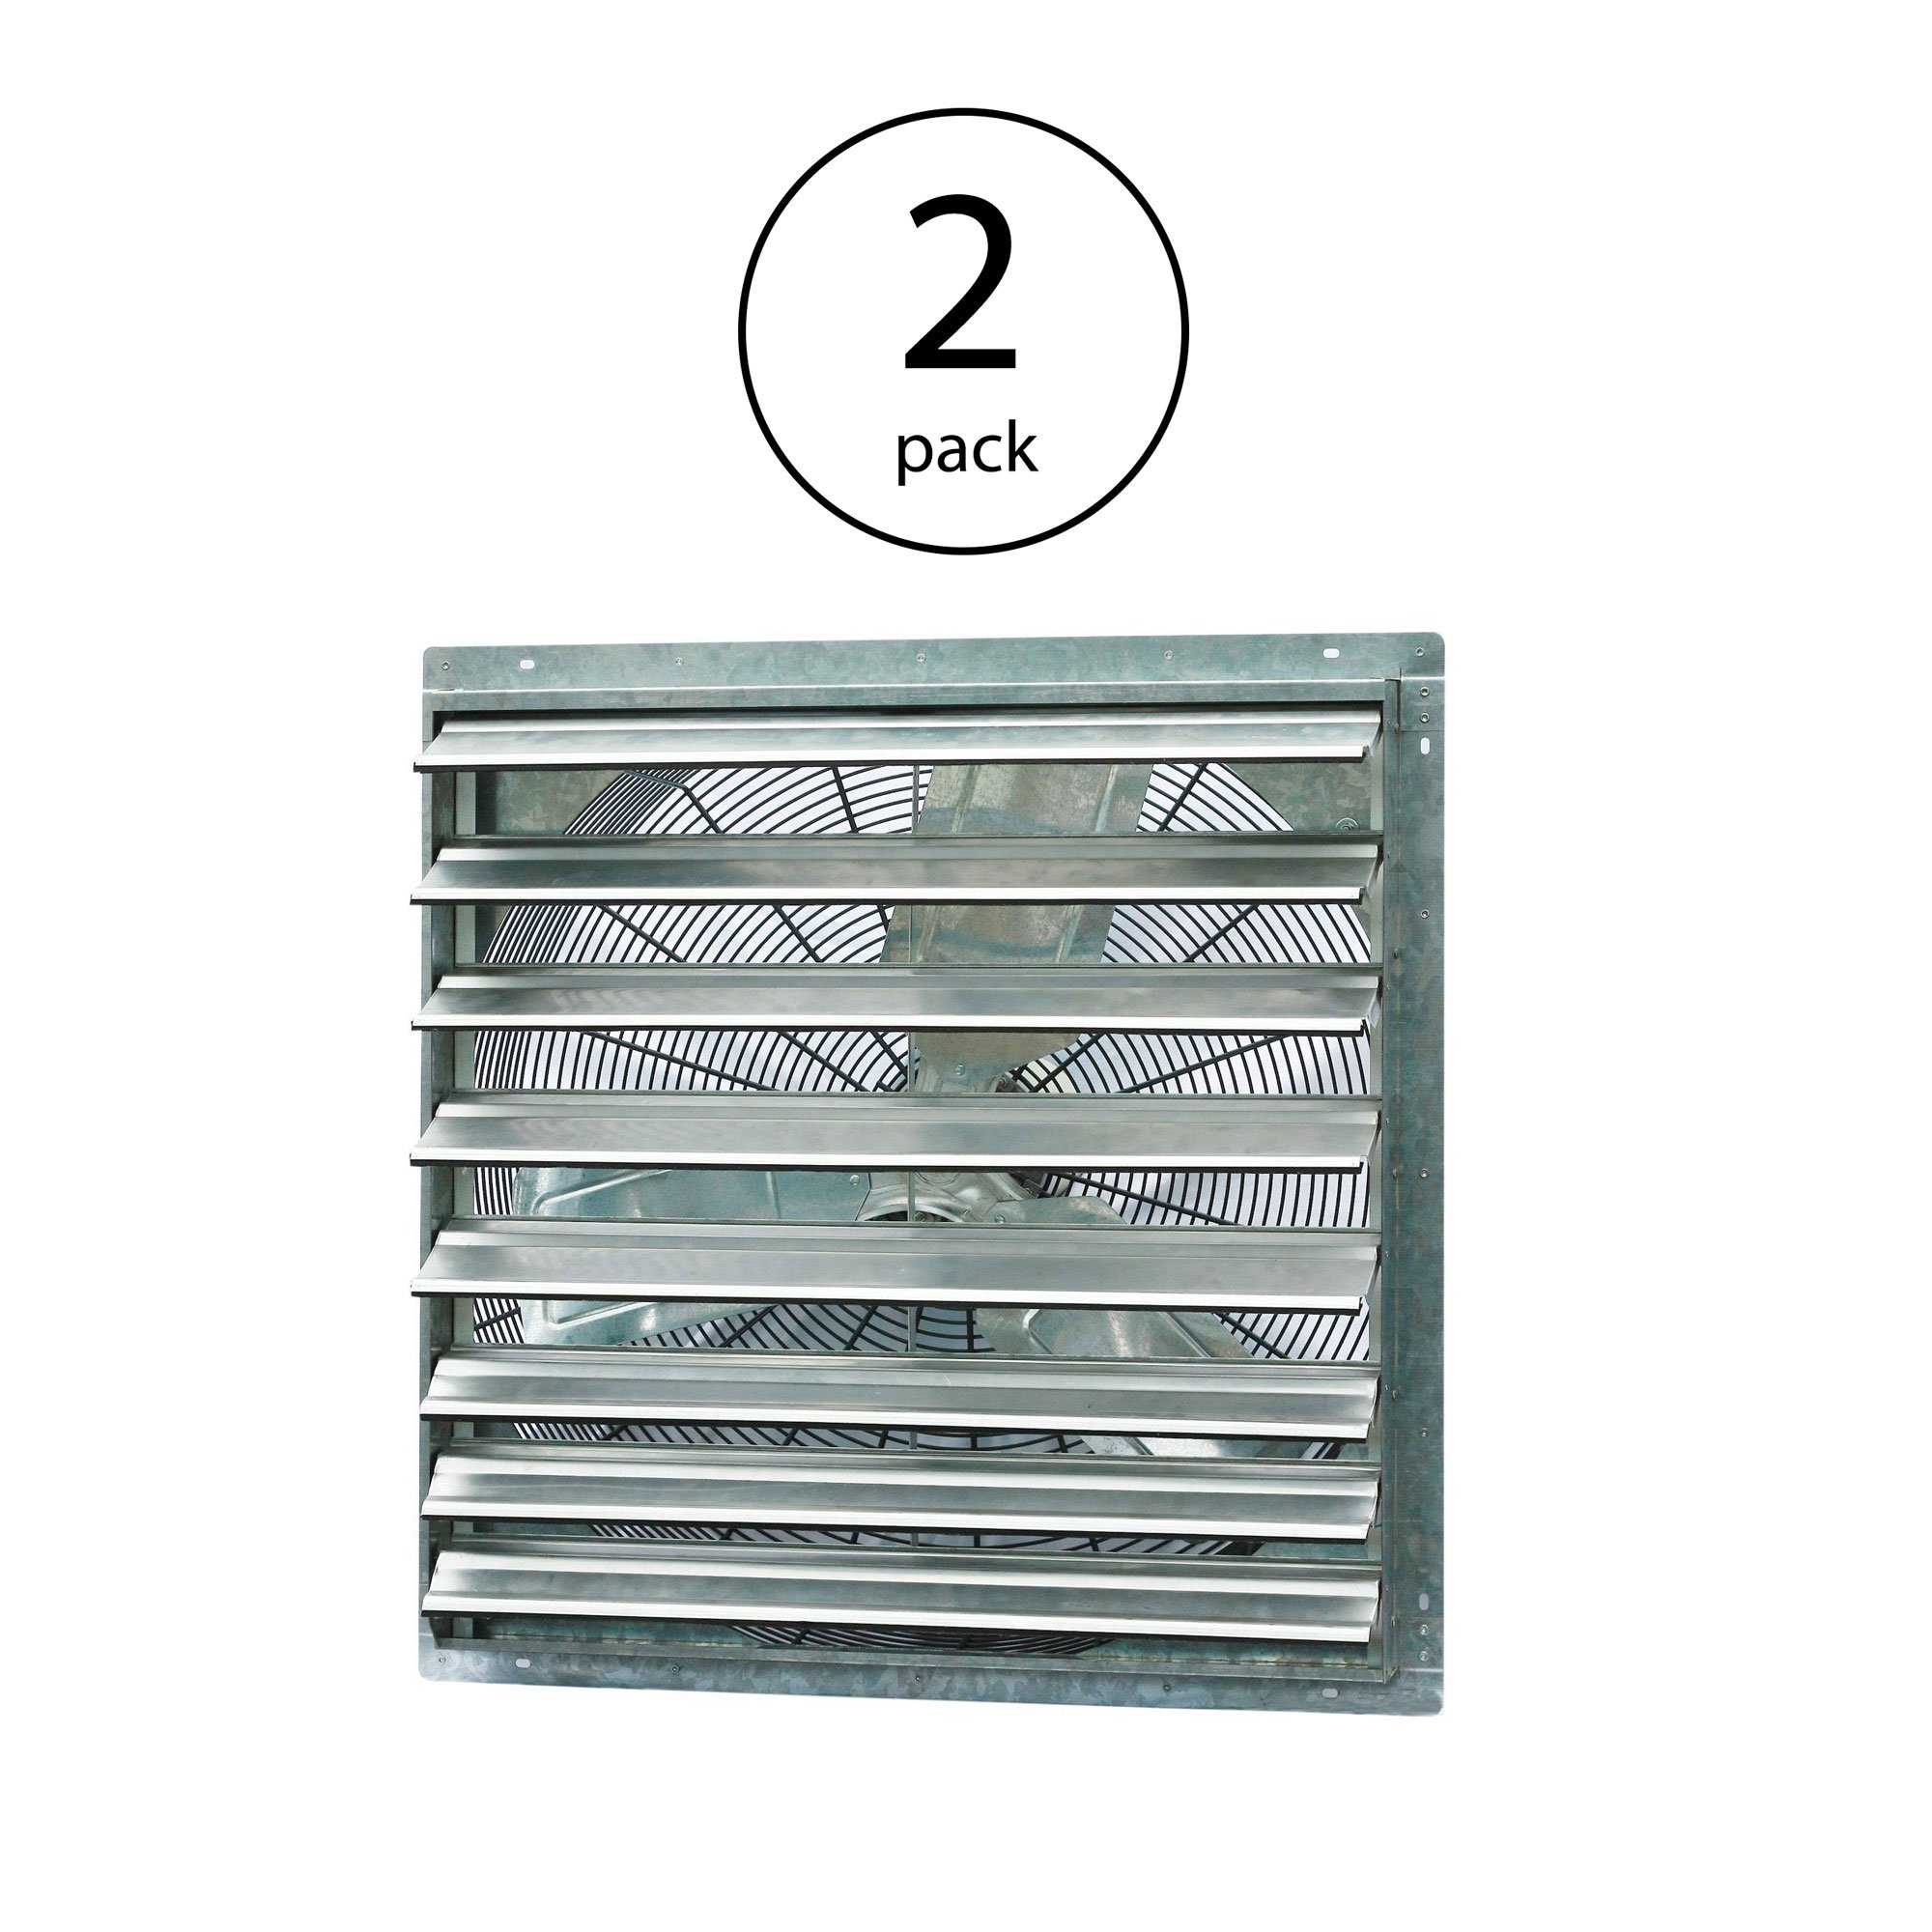 "iLiving 30"" Single Speed Shutter Wall Mountable Indoor Exhaust Fan (2 Pack)"